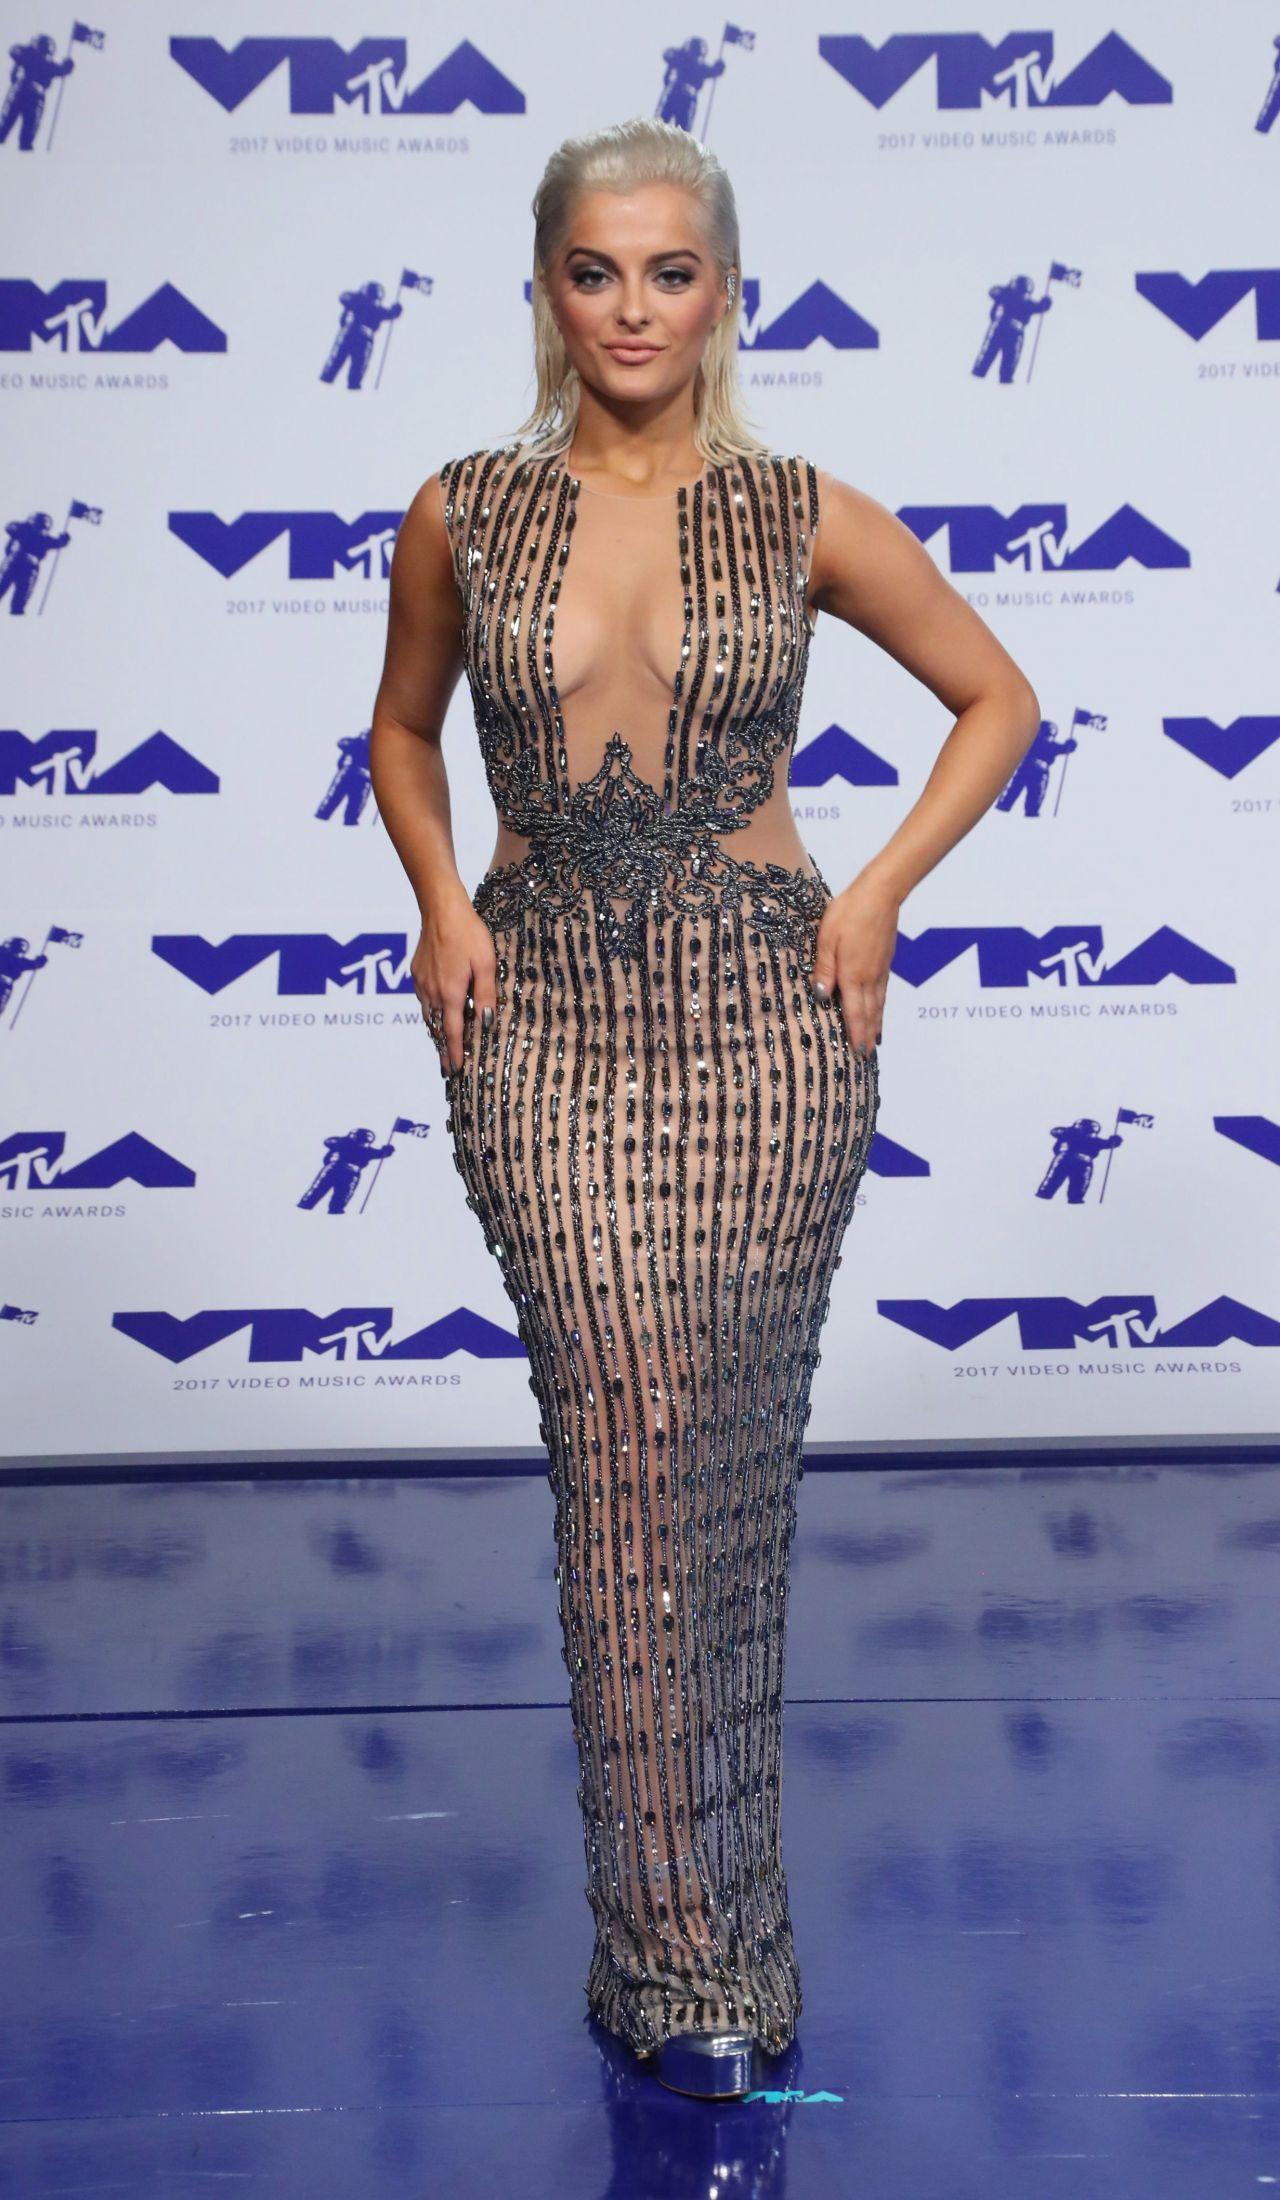 Bebe Rexha Mtv Video Music Awards In Los Angeles 08 27 2017